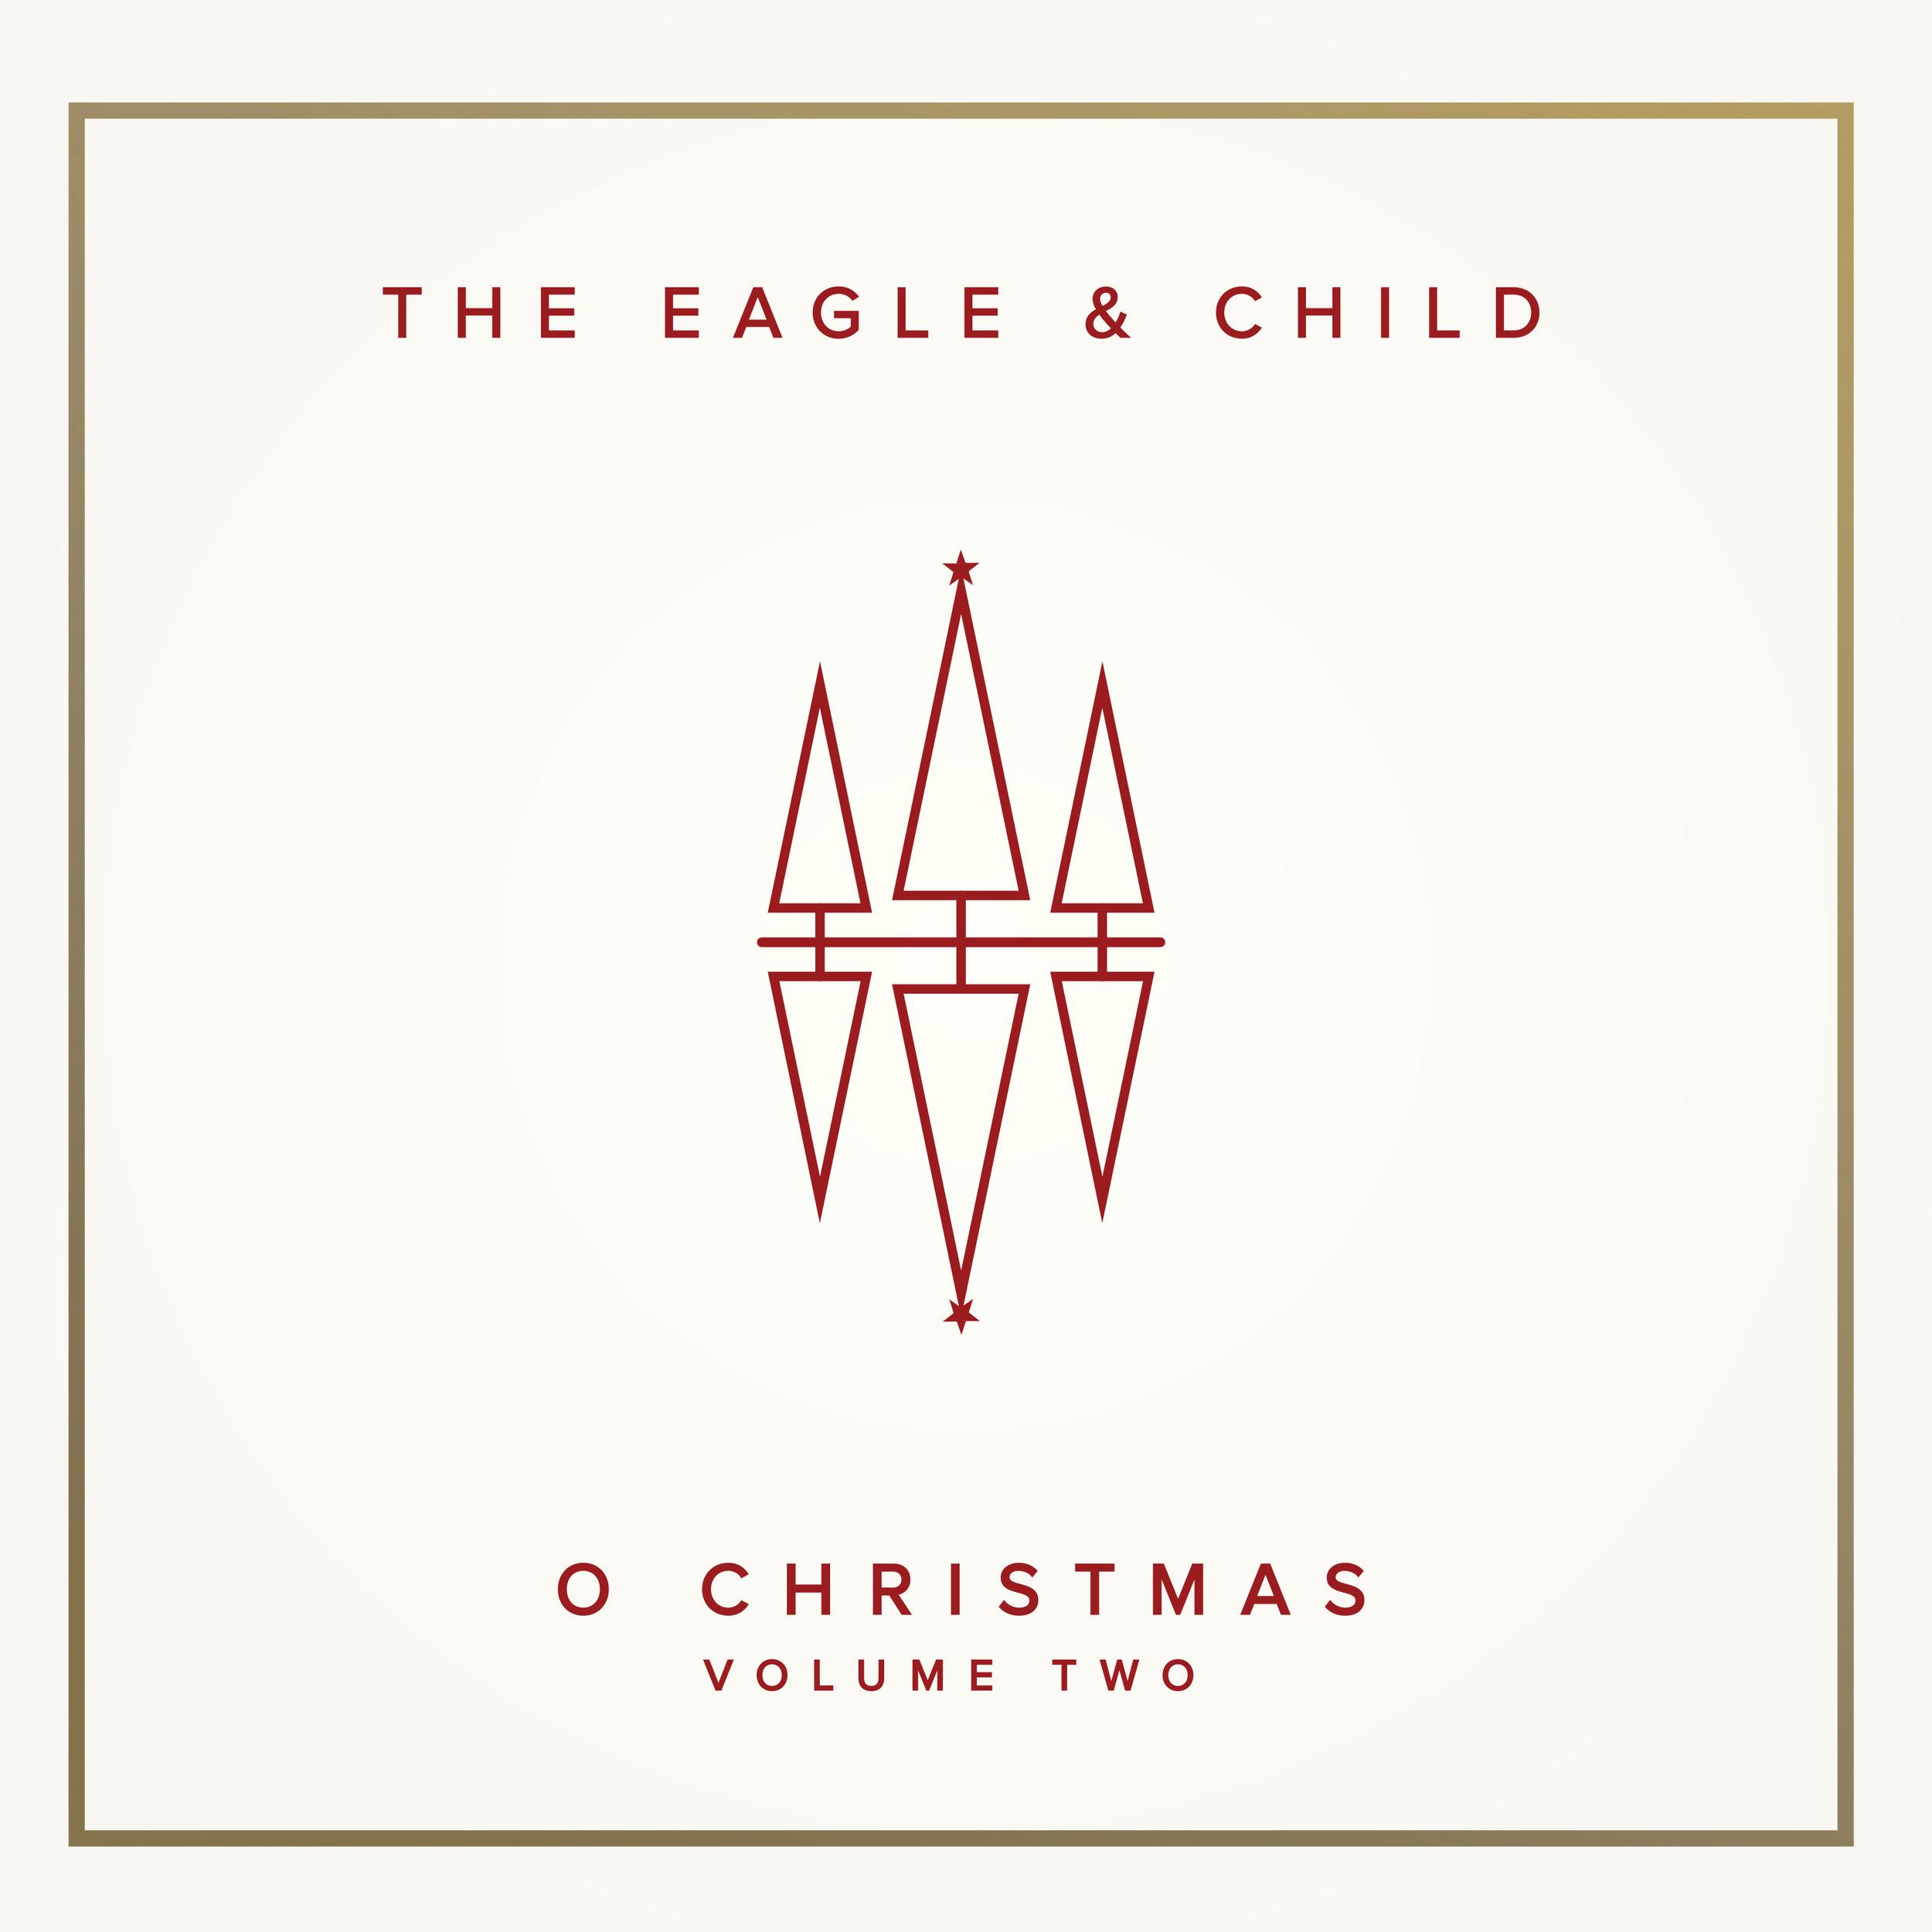 O Christmas Vol II 3000.jpg